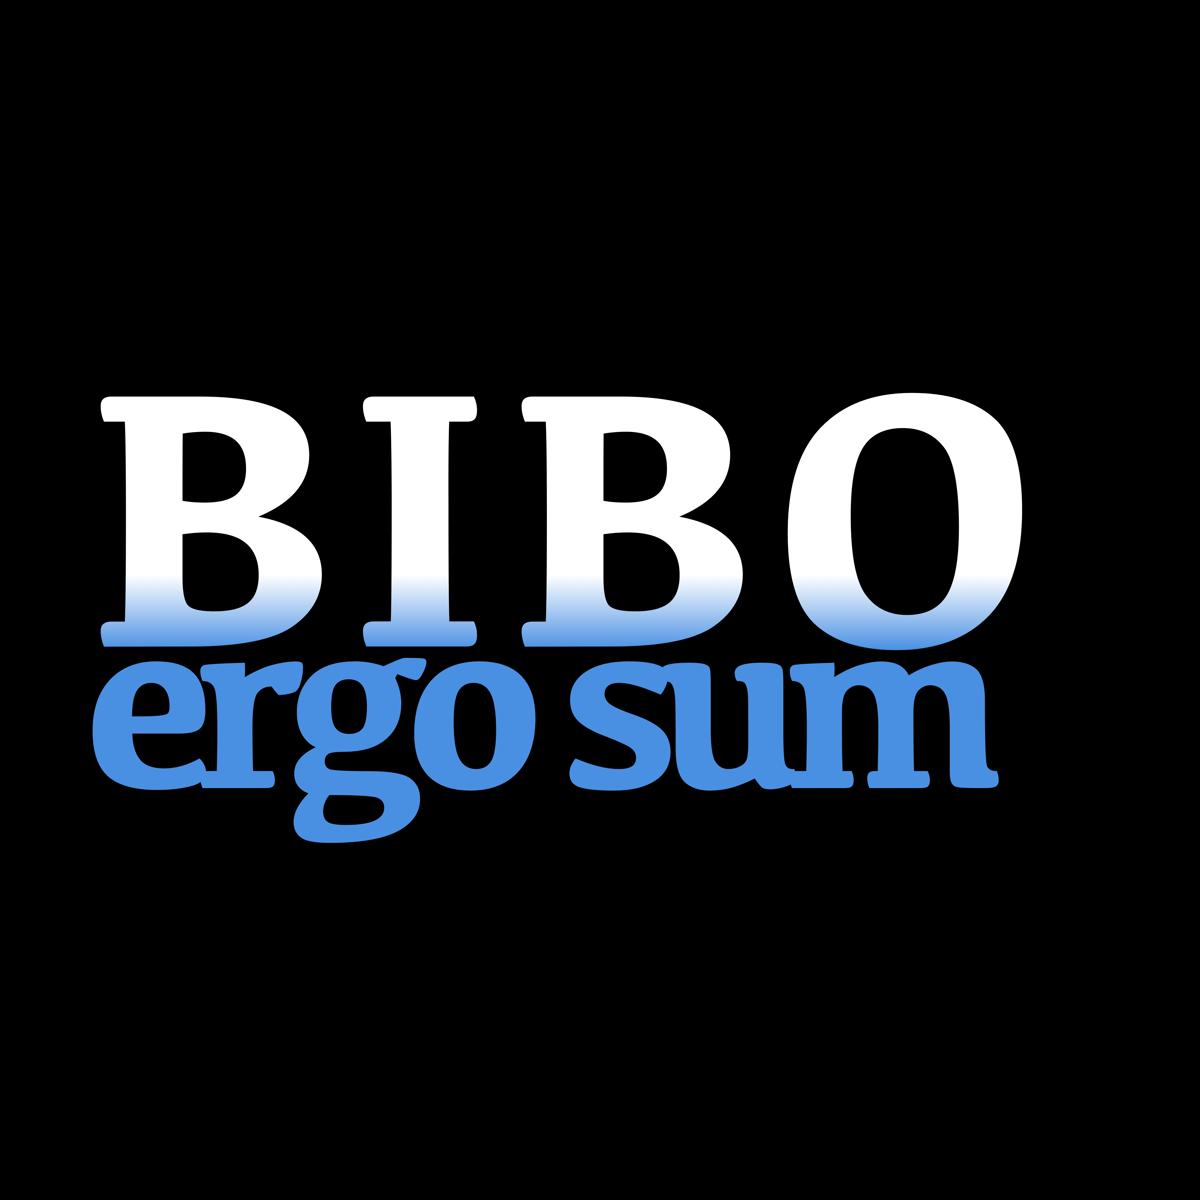 Image of Bibo Ergo Sum